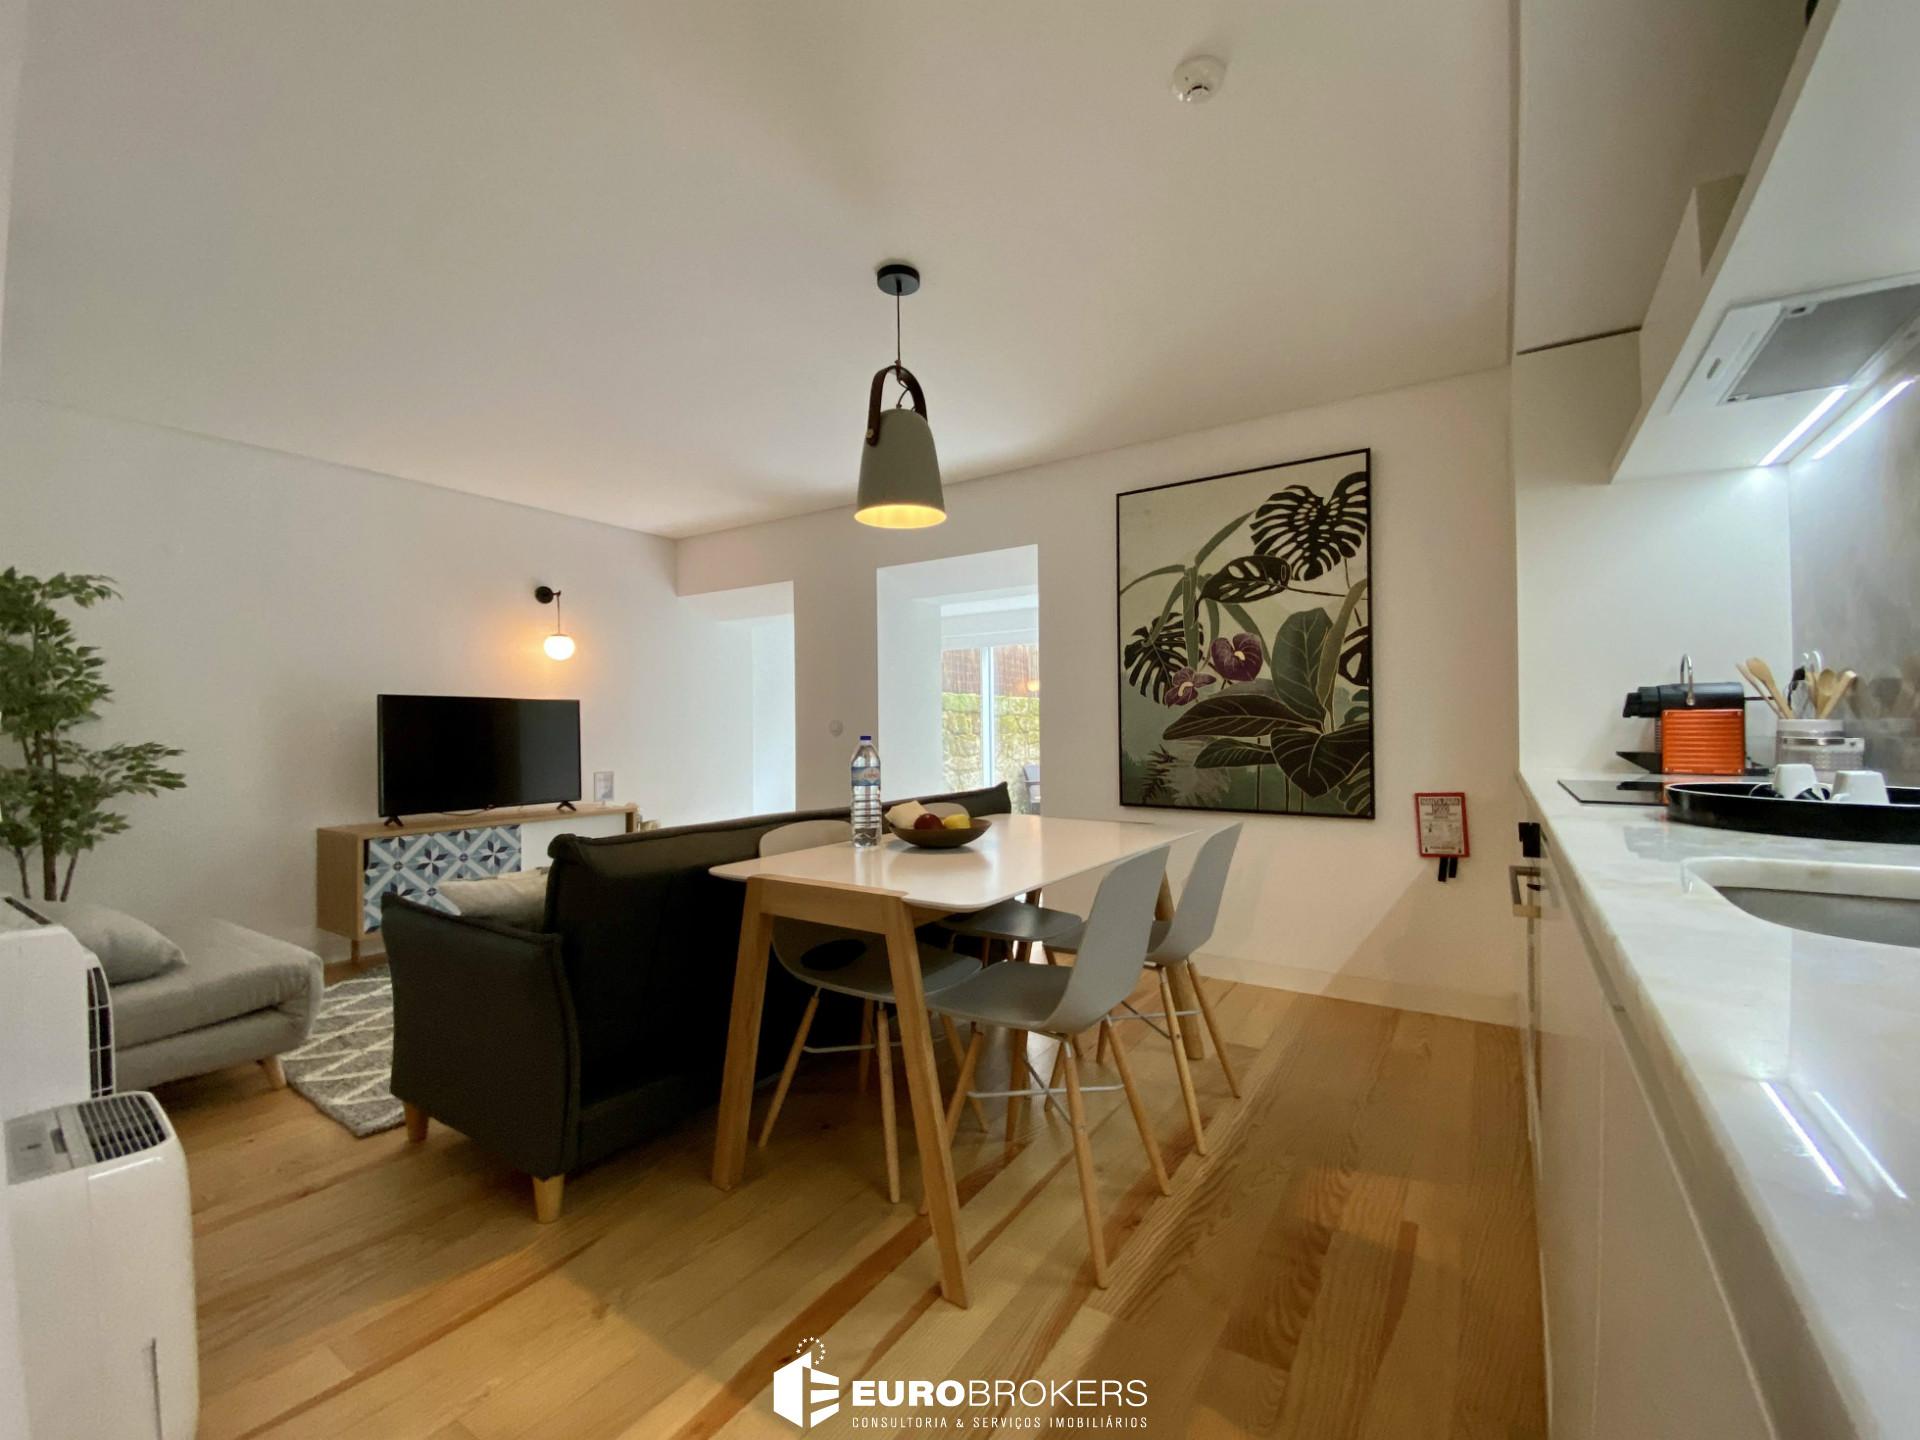 Open Space Küche